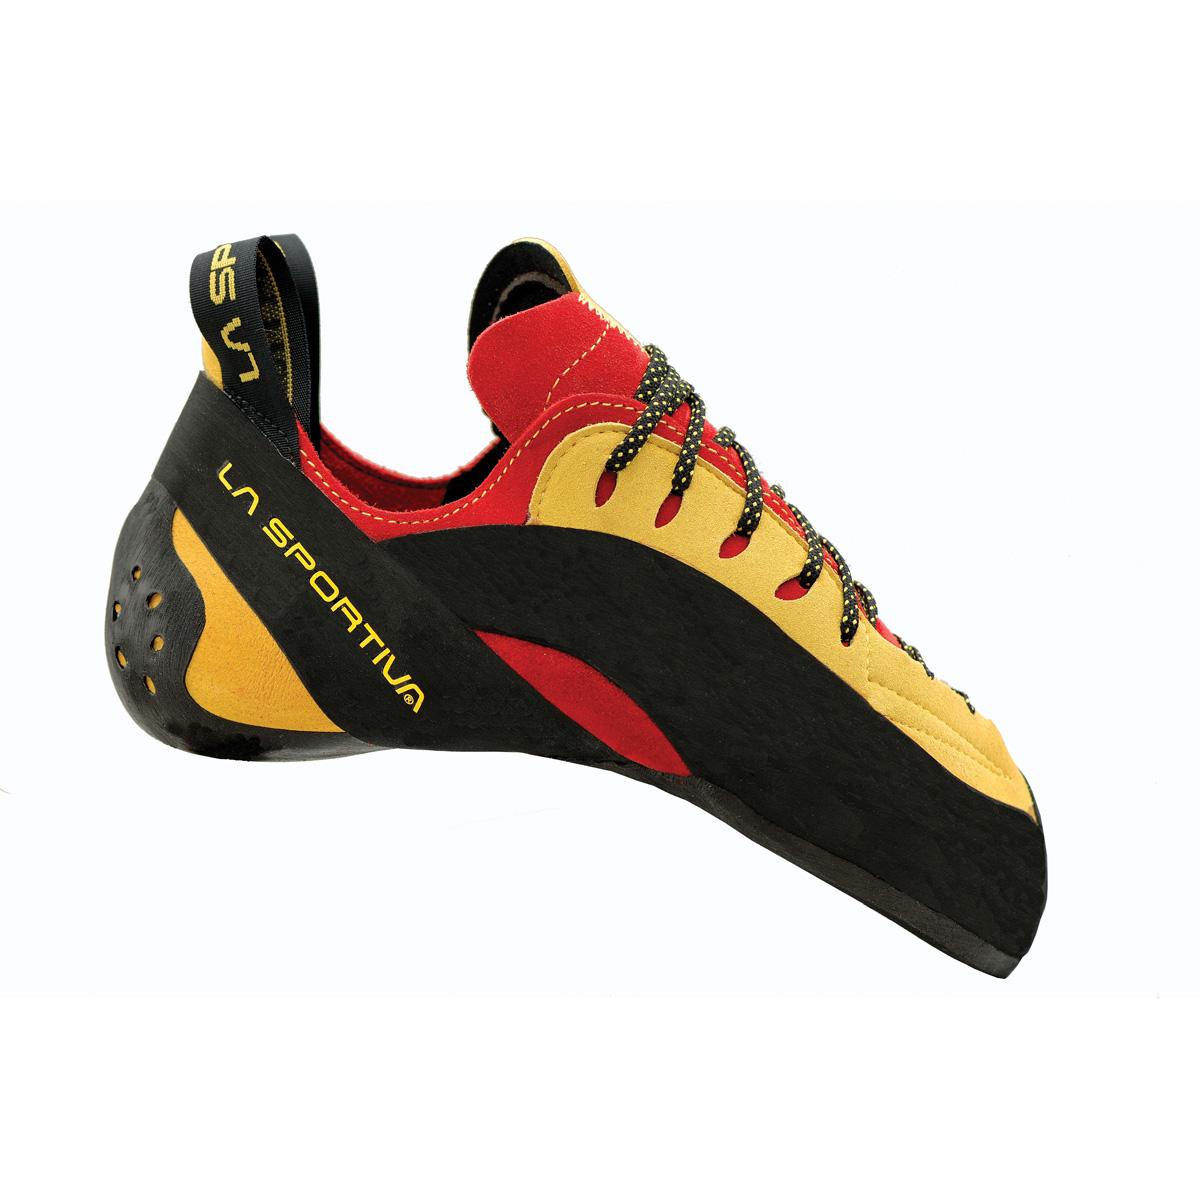 la sportiva testarossa climbing shoe climbing shoes